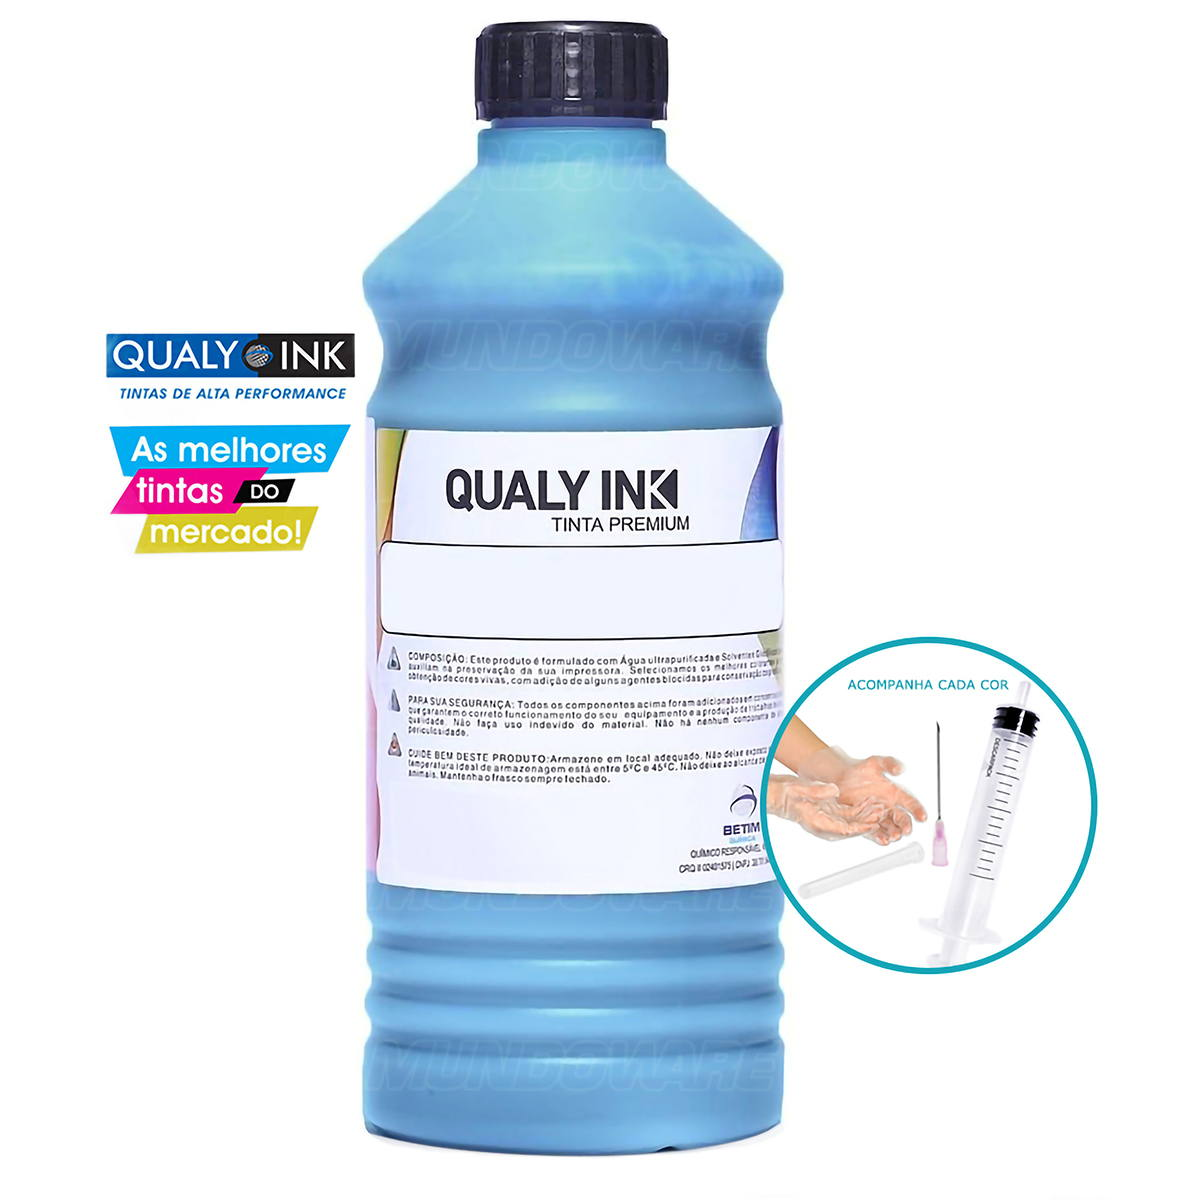 Compatível: Tinta Corante Qualy-Ink CC3E-1512 Série 673 para Epson L800 L805 L810 L850 L1800 Ciano 1L